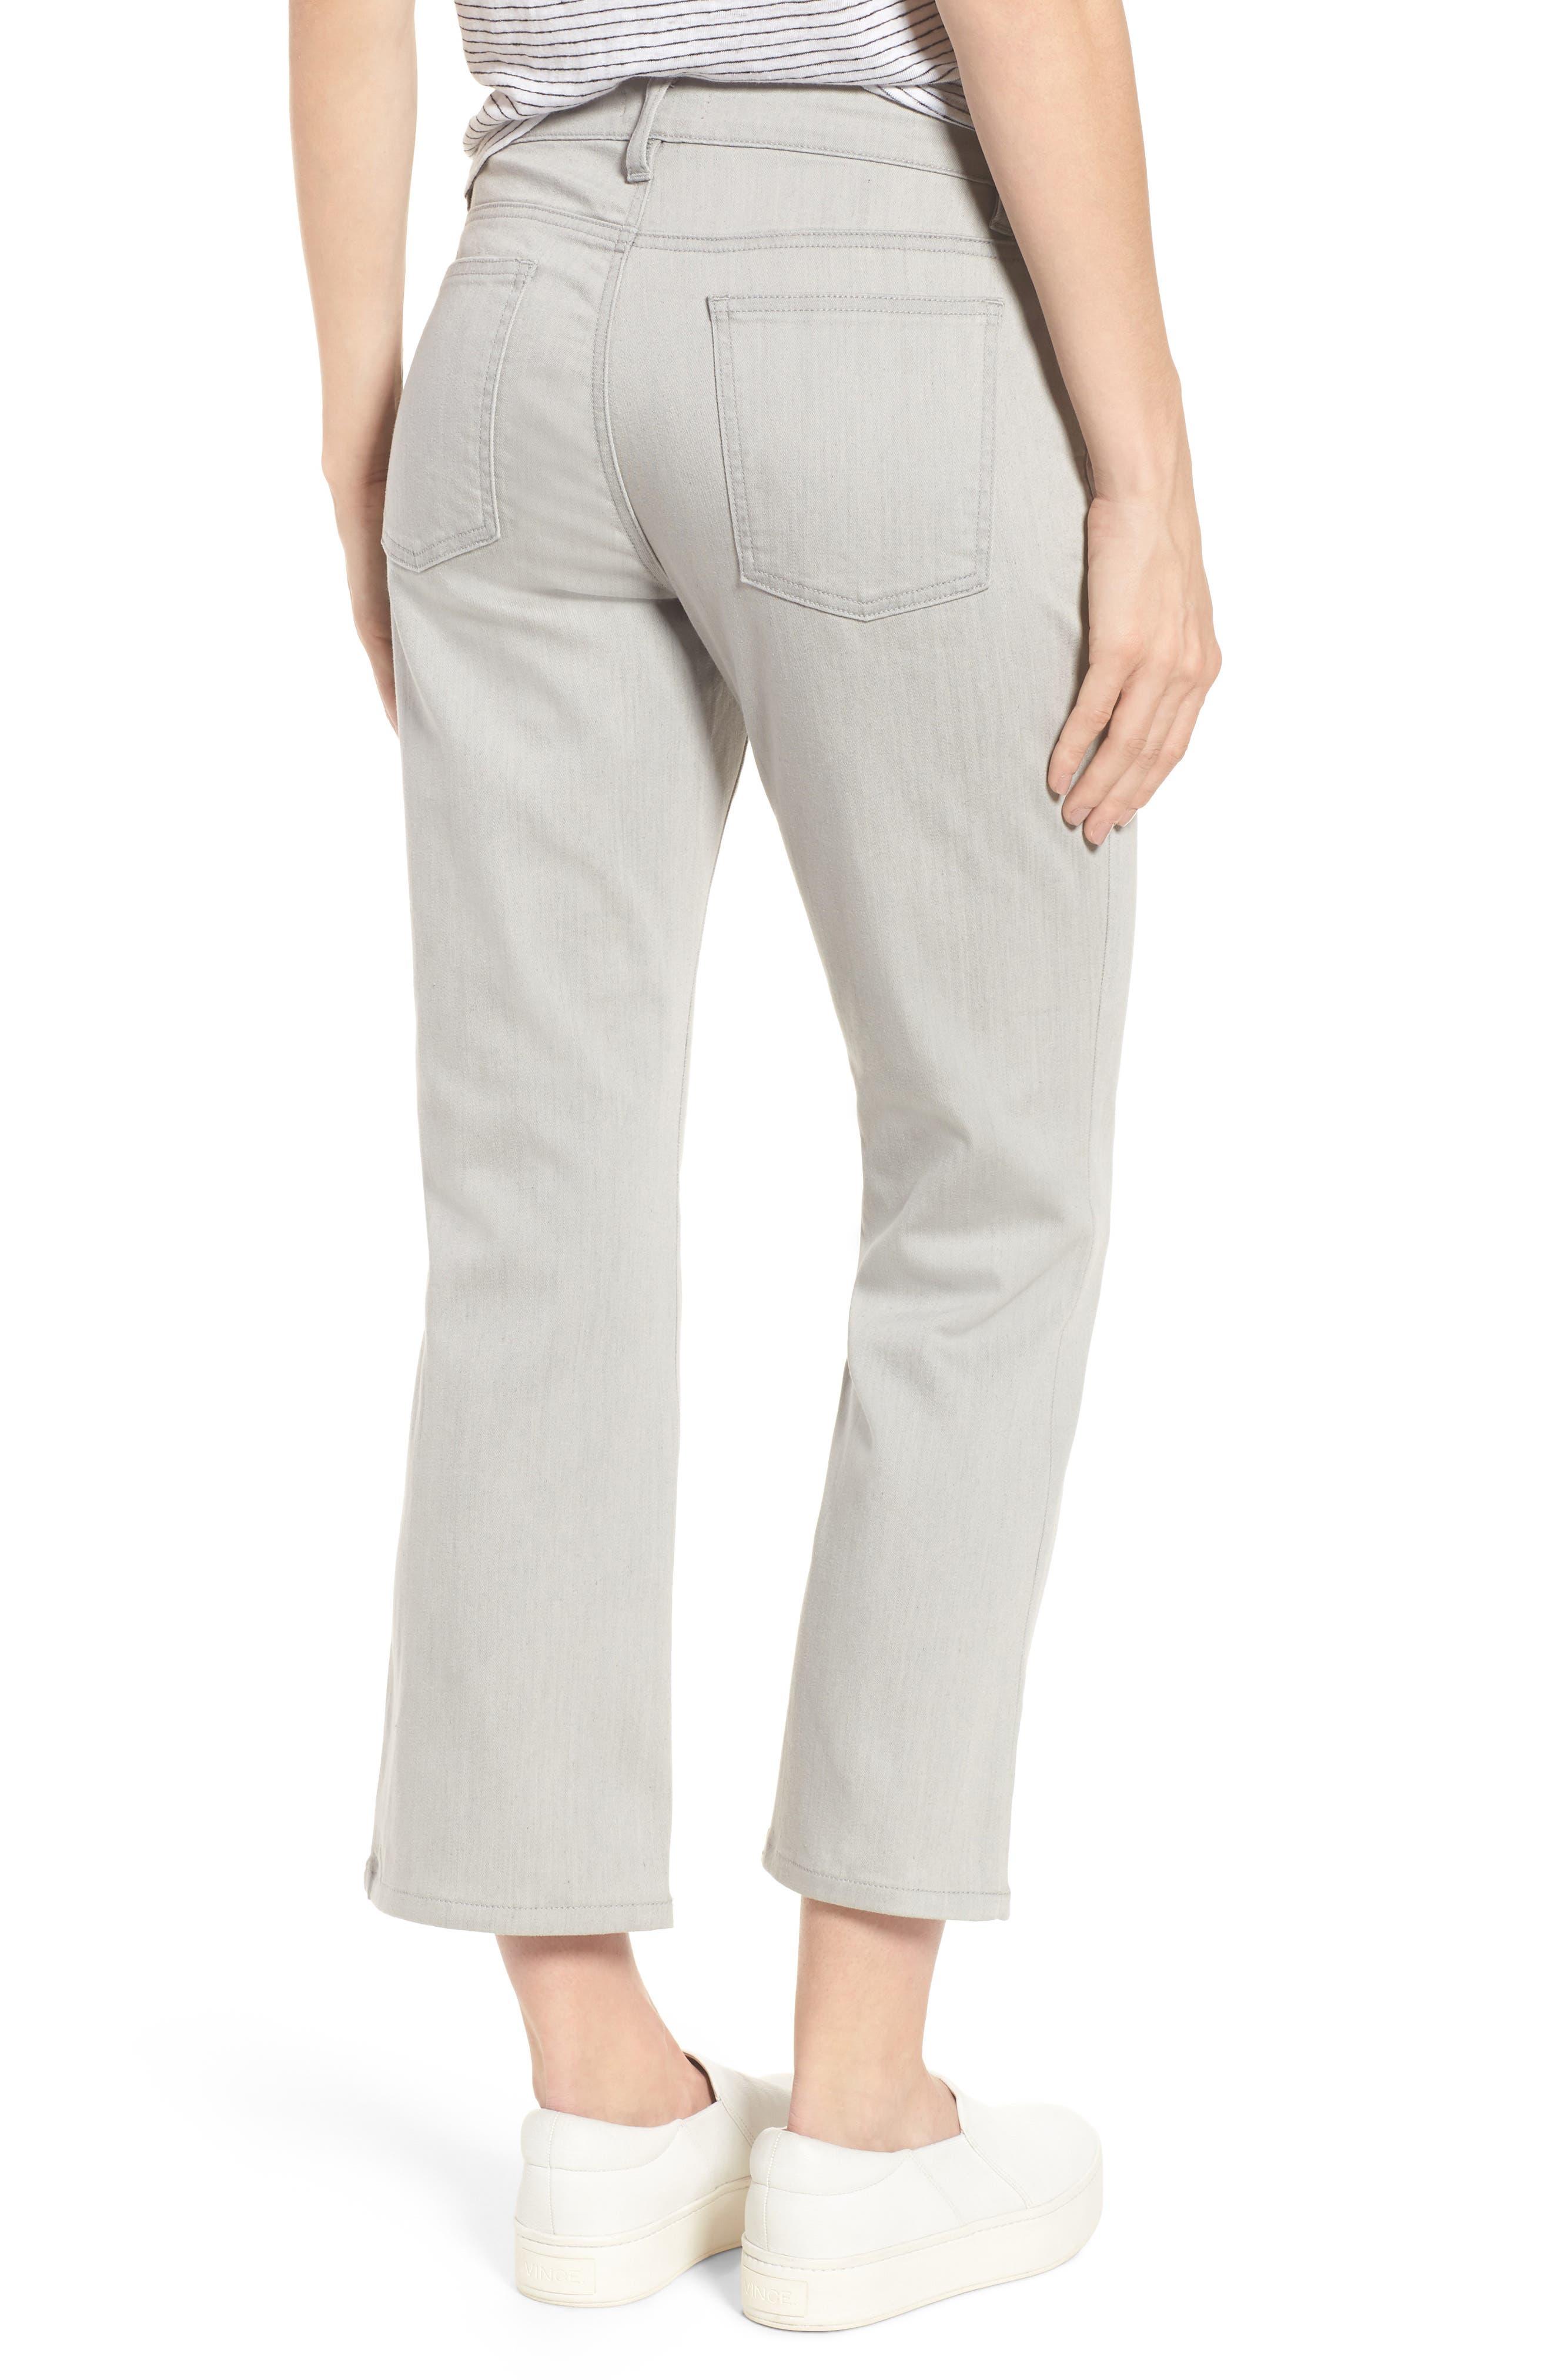 Organic Cotton Blend Crop Flare Jeans,                             Alternate thumbnail 2, color,                             Sun Bleached Gray